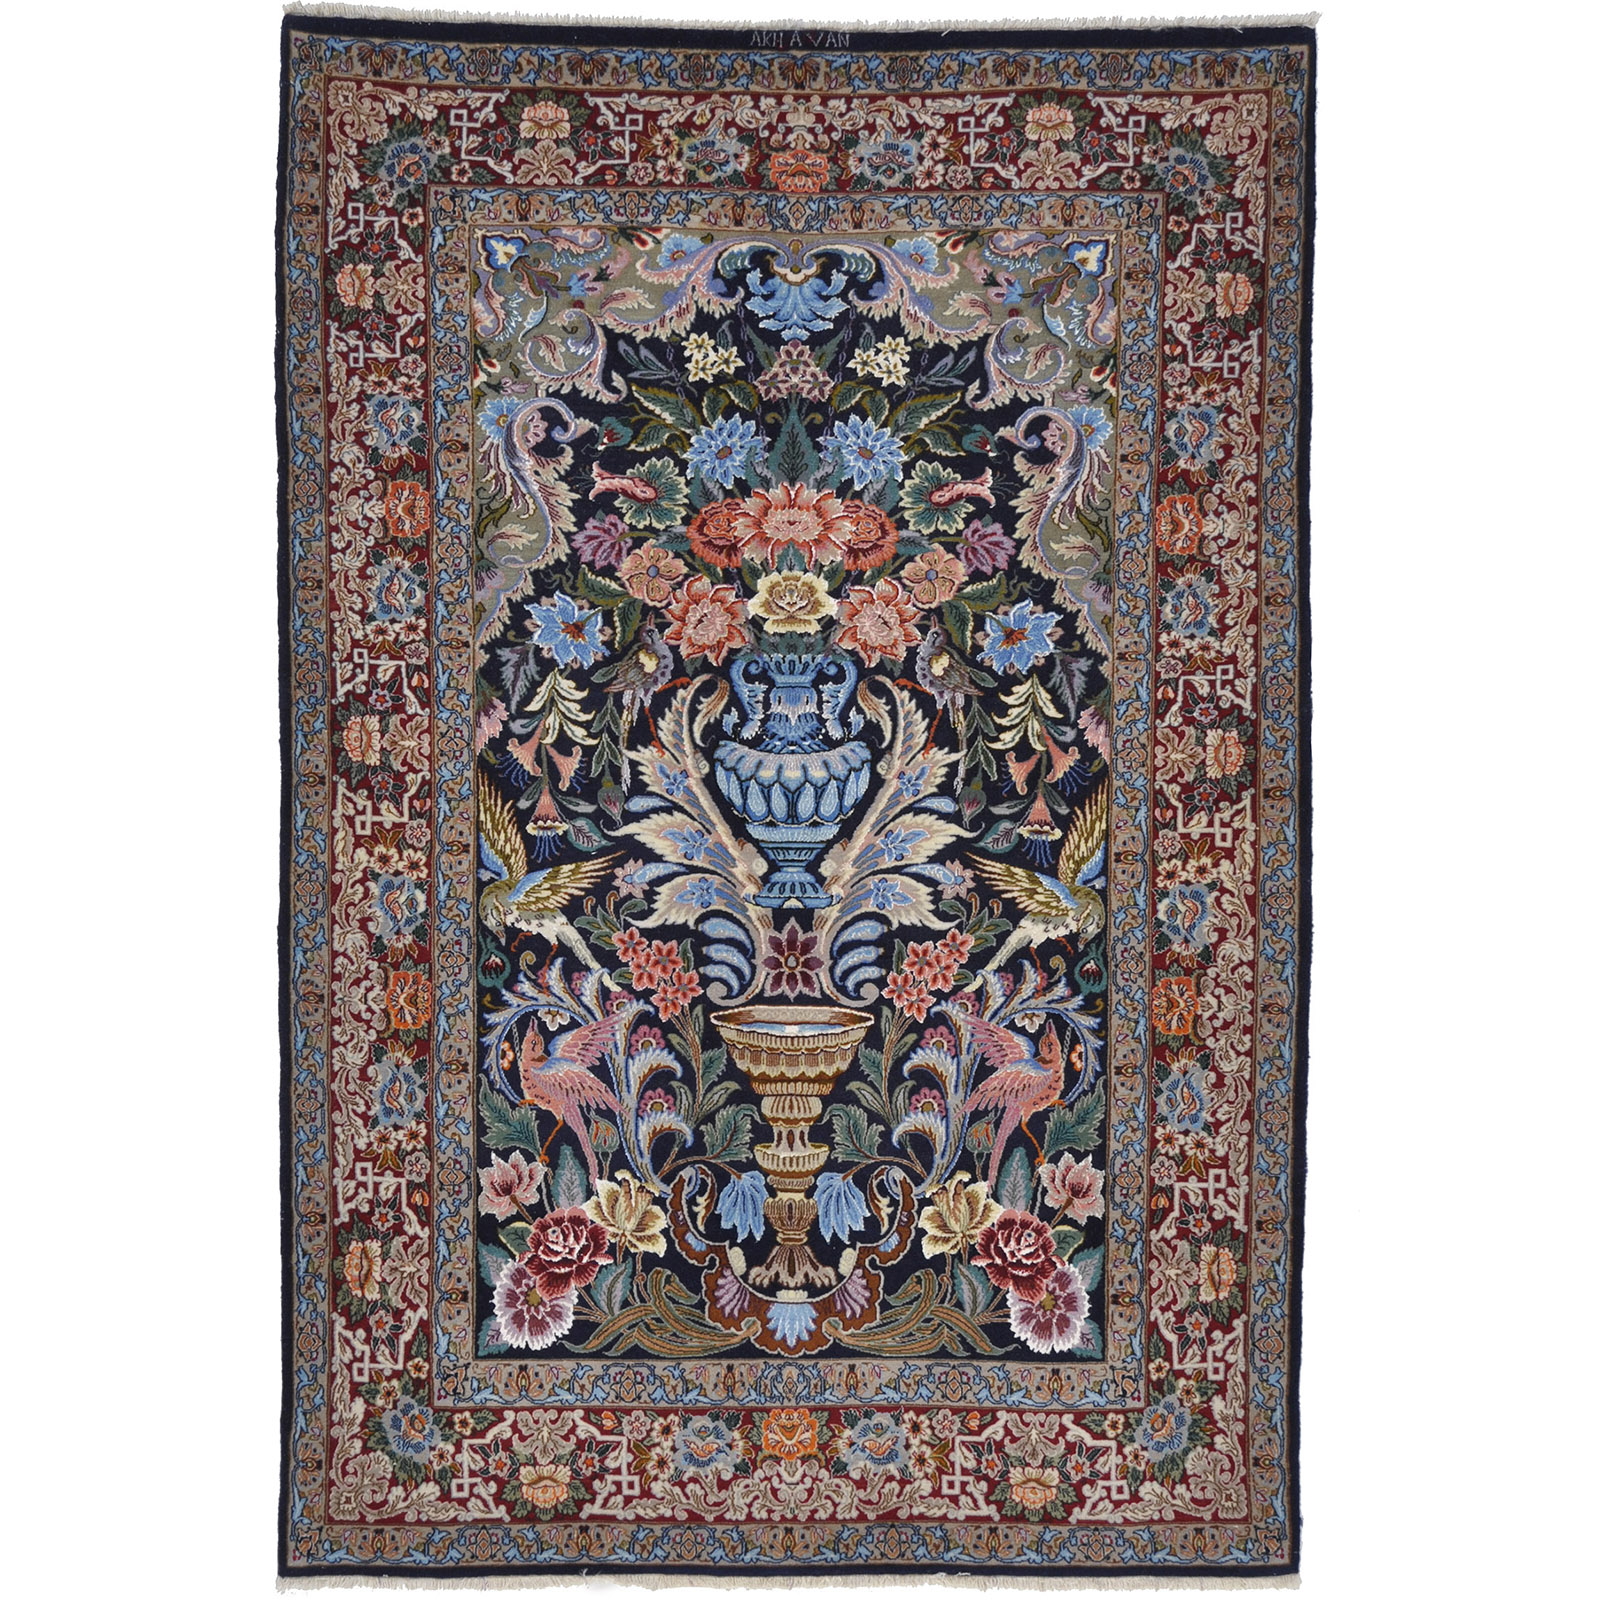 Esfahan matta storlek 165x108 cm